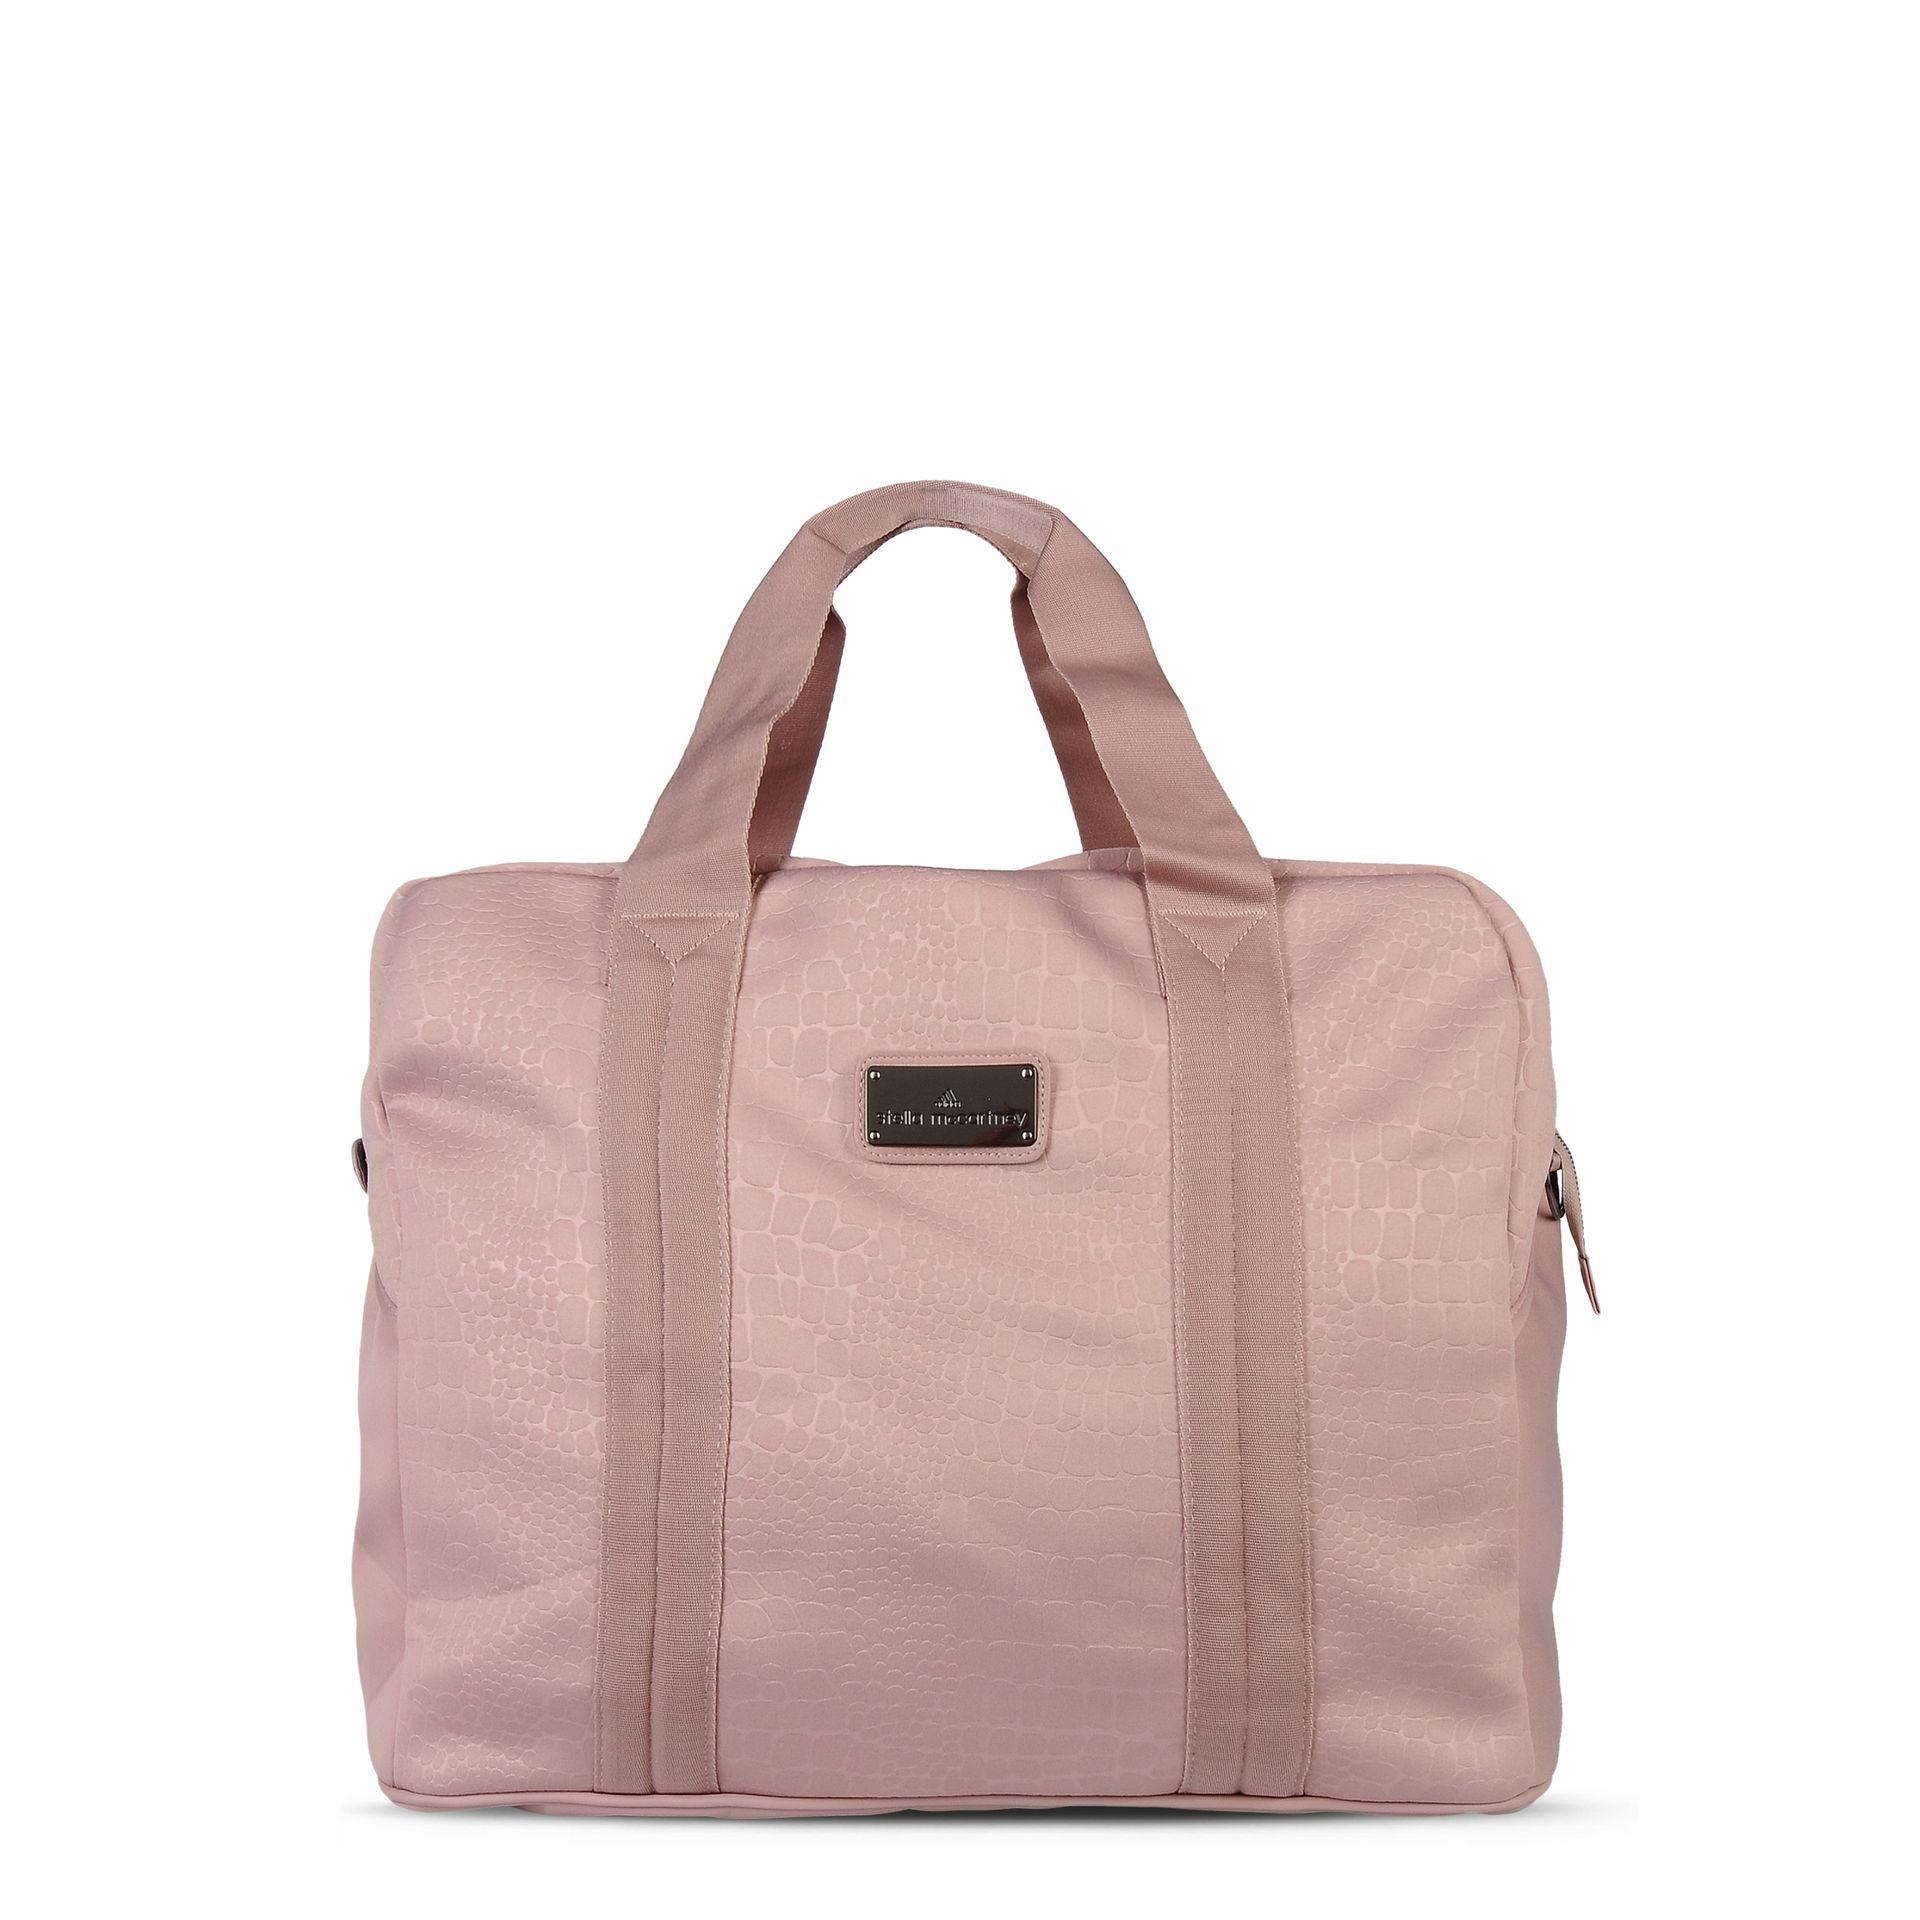 Lyst - adidas By Stella McCartney Pink Essentials Sports Bag in Pink cf1415c745